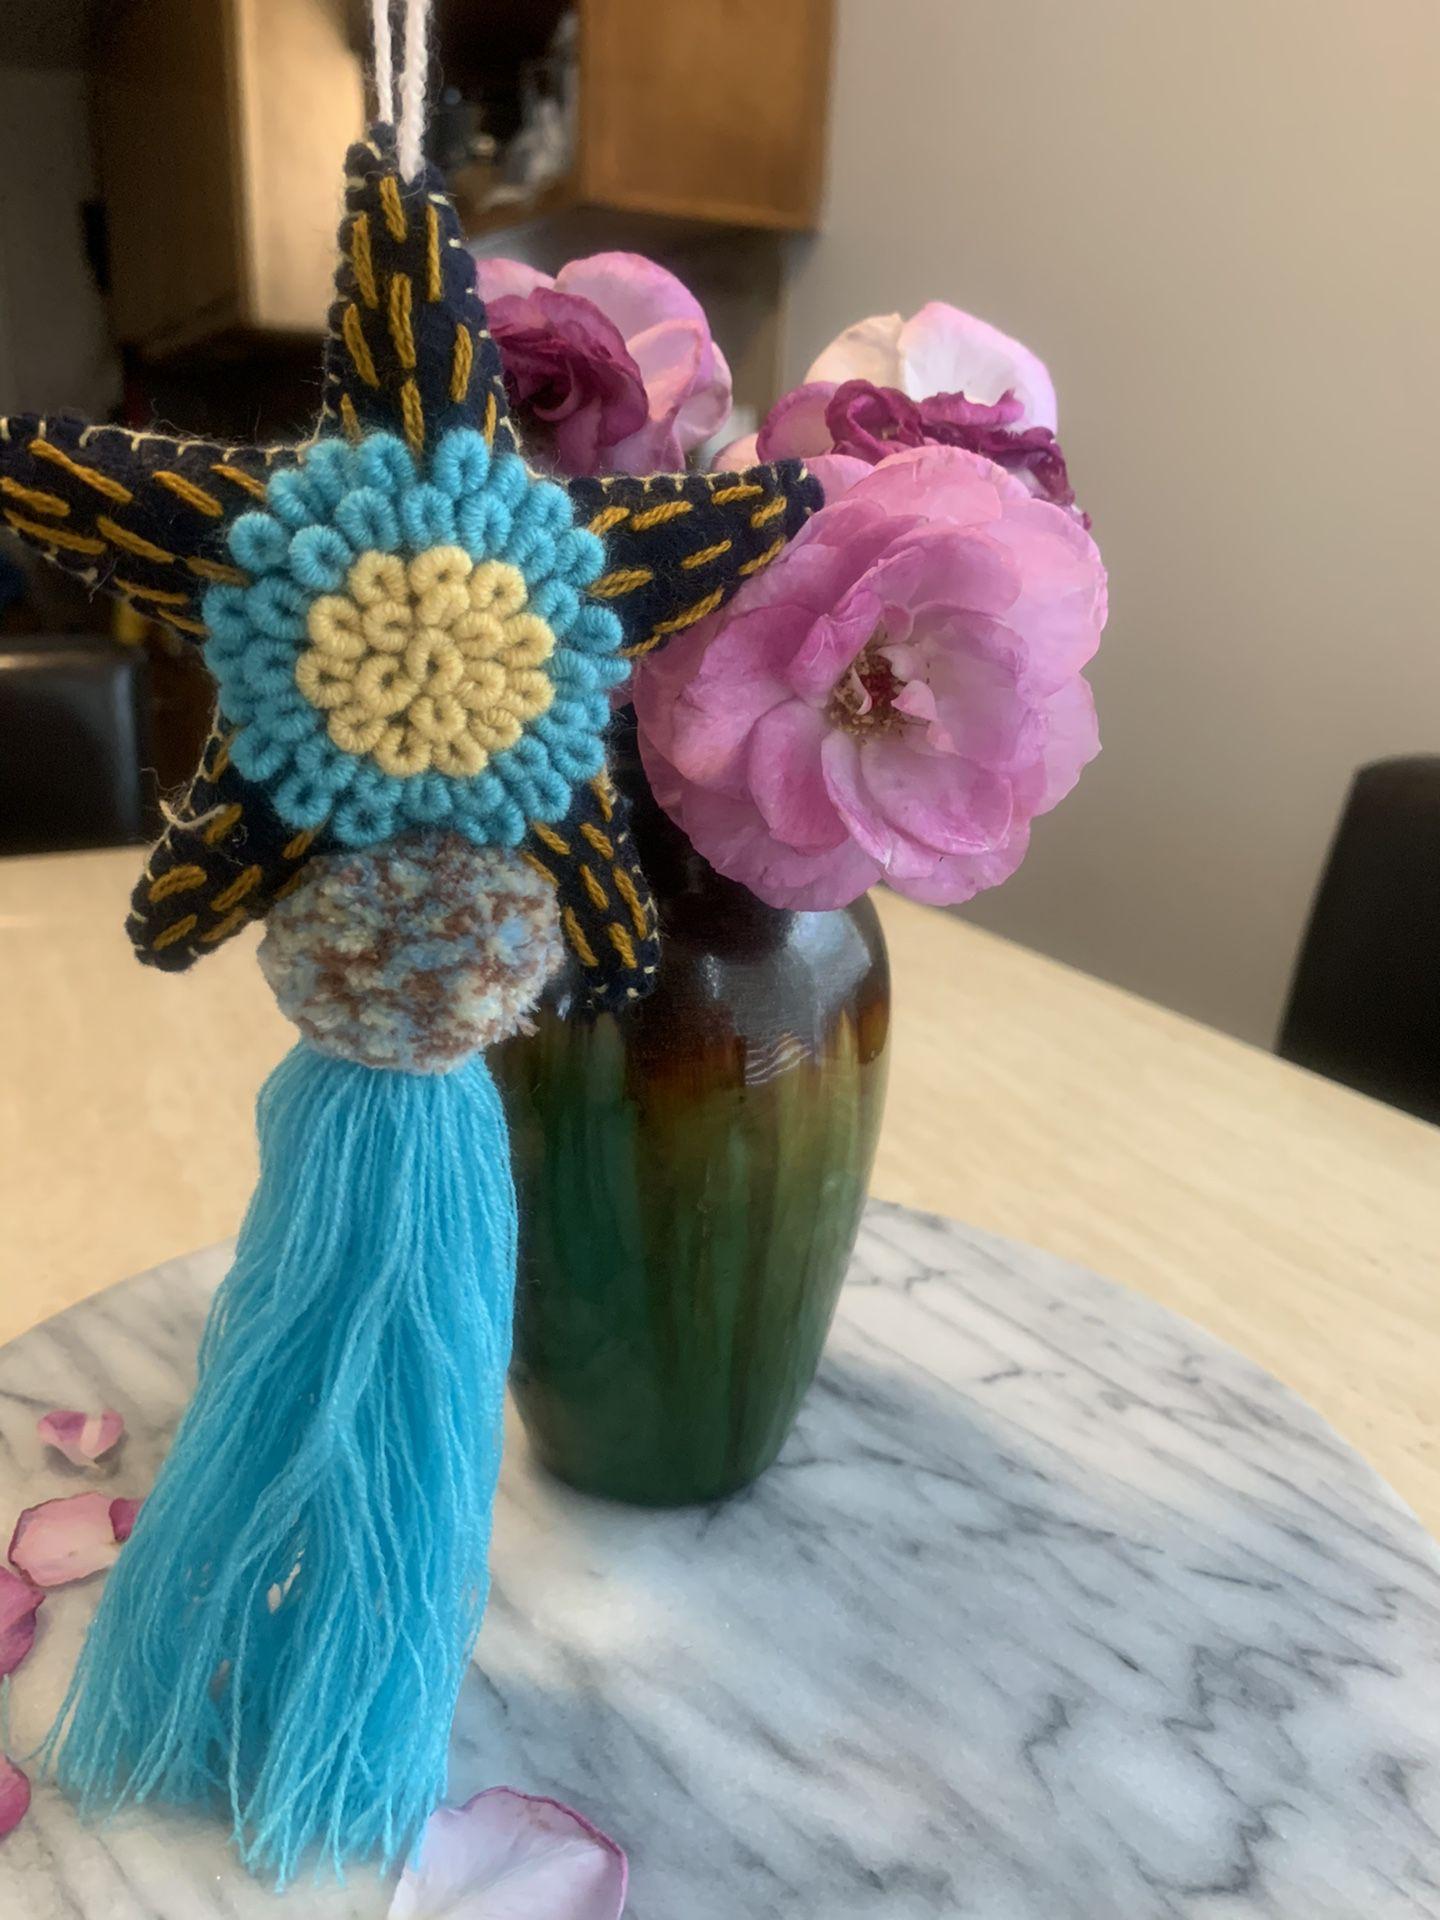 Handmade star with tassel